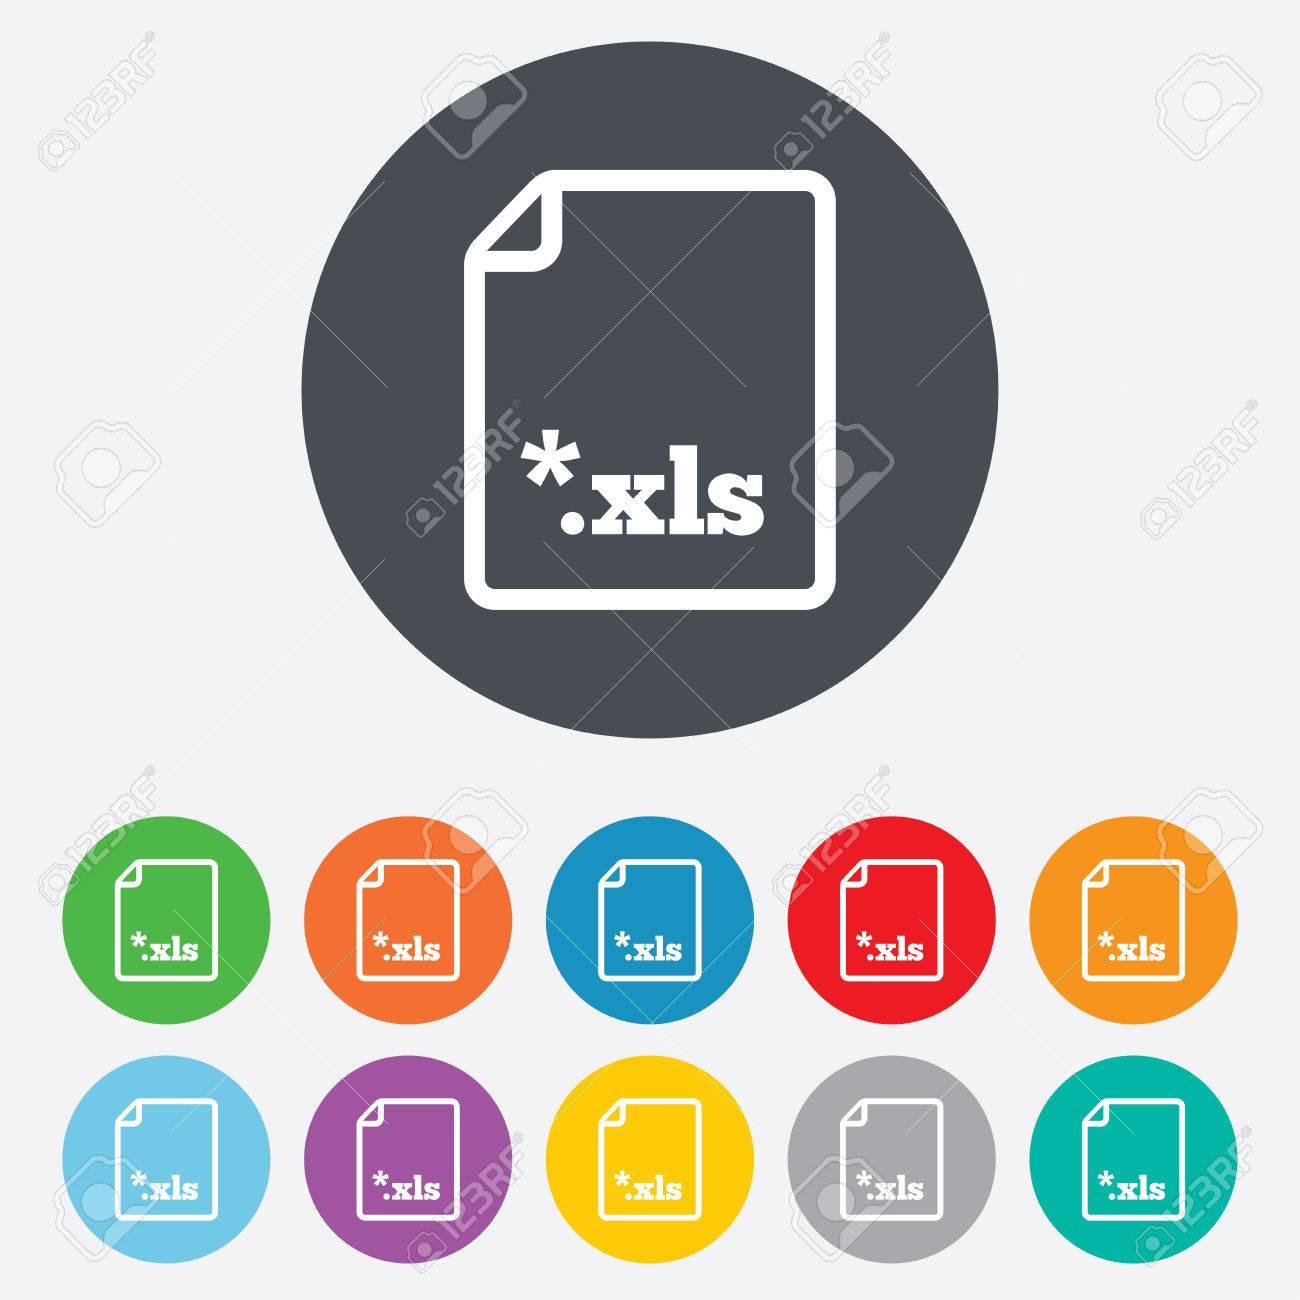 Файл xls xls скачать